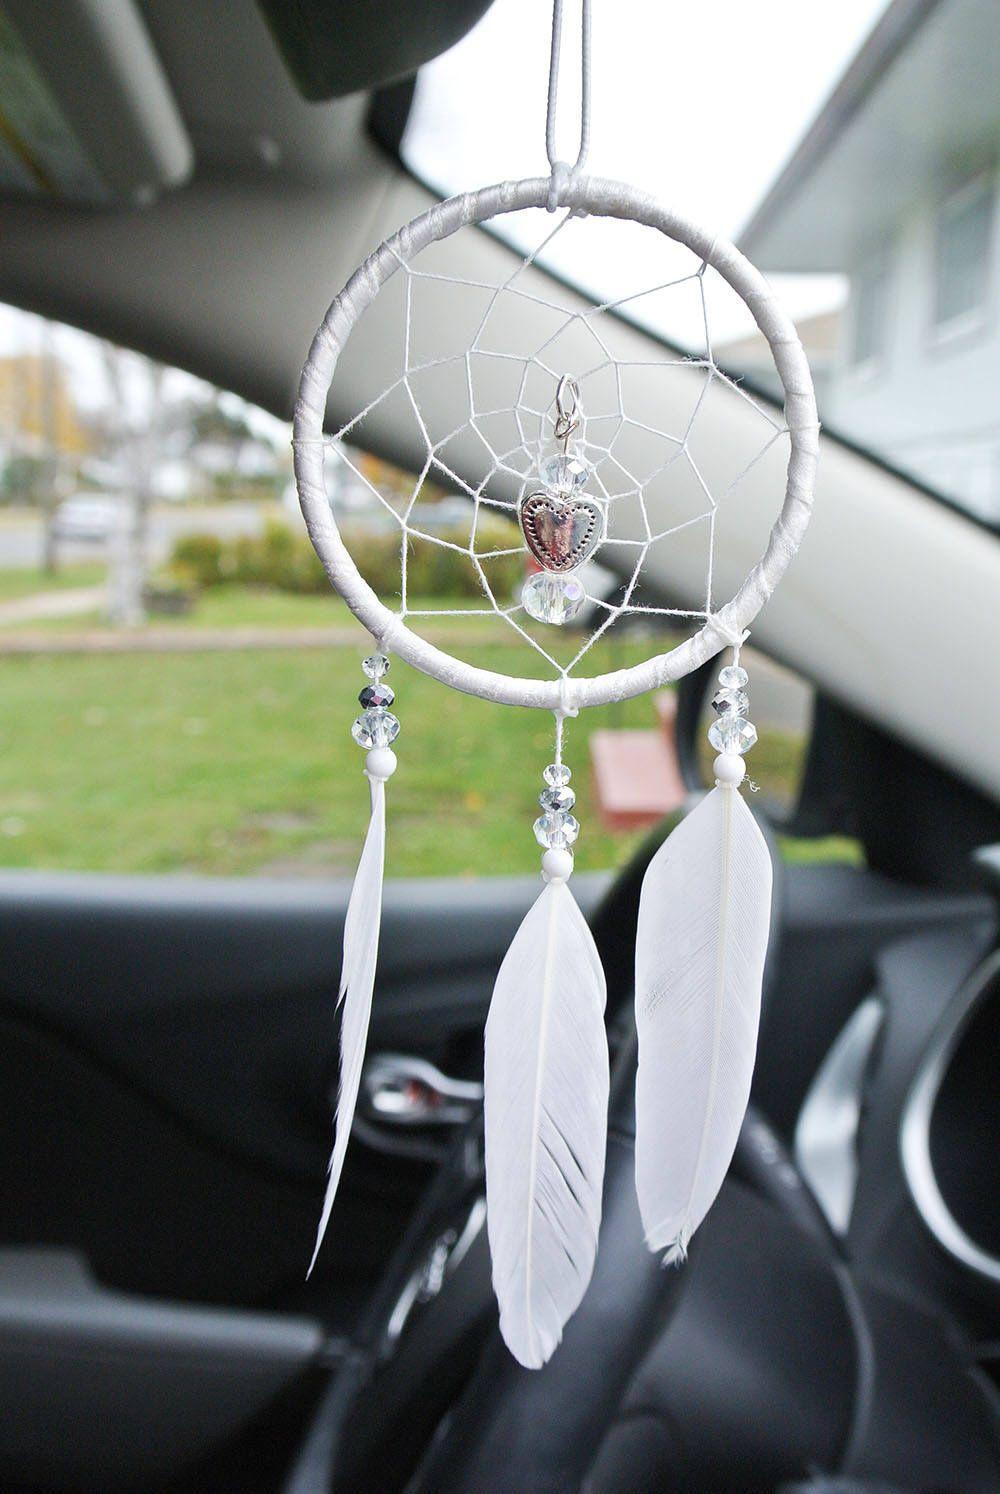 Rear View Mirror Dream Catcher, Small Dreamcatcher for Car